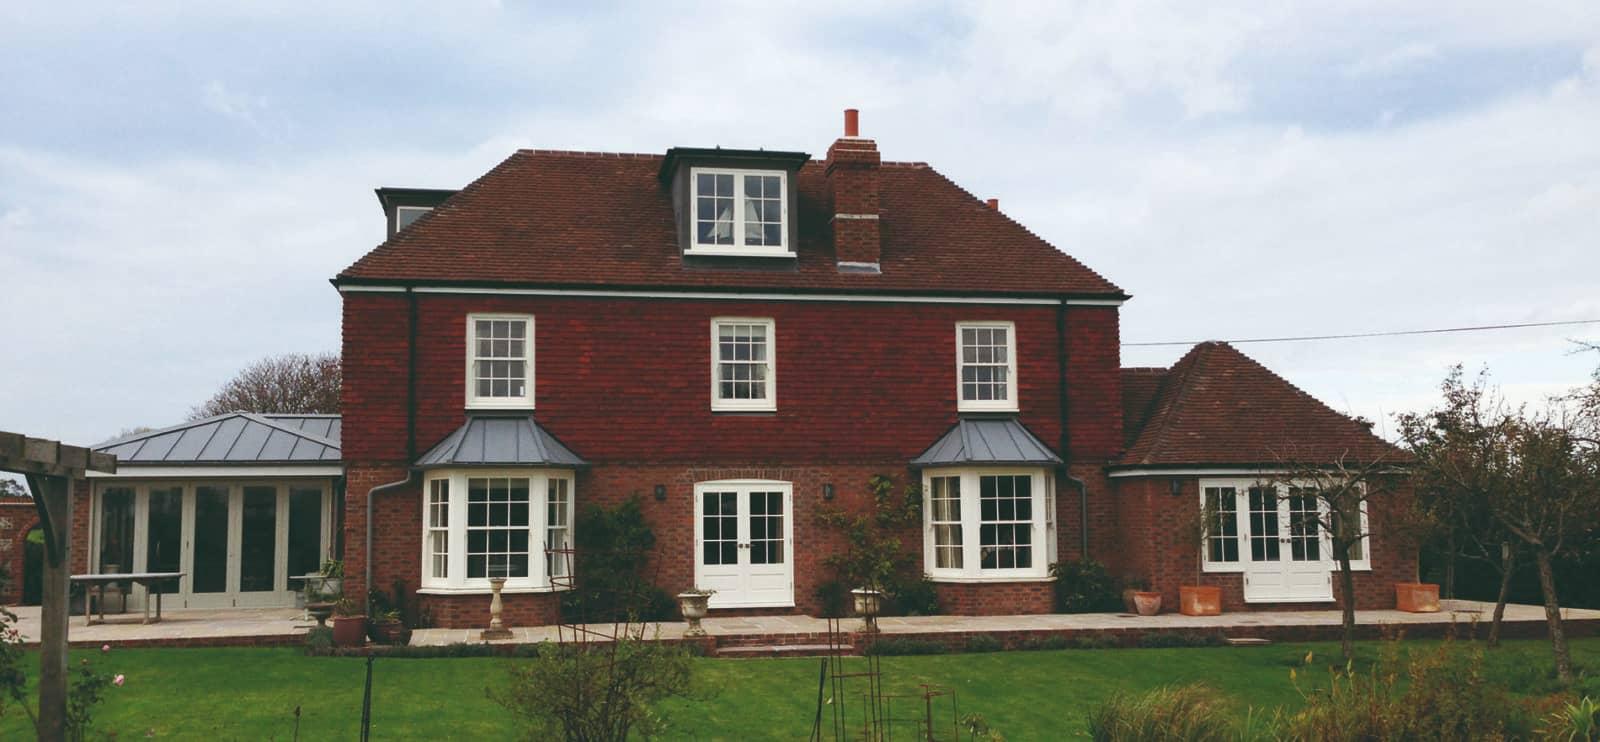 Lifestiles - Handmade Heather Clay Roof Tiles - Chidham, England 2